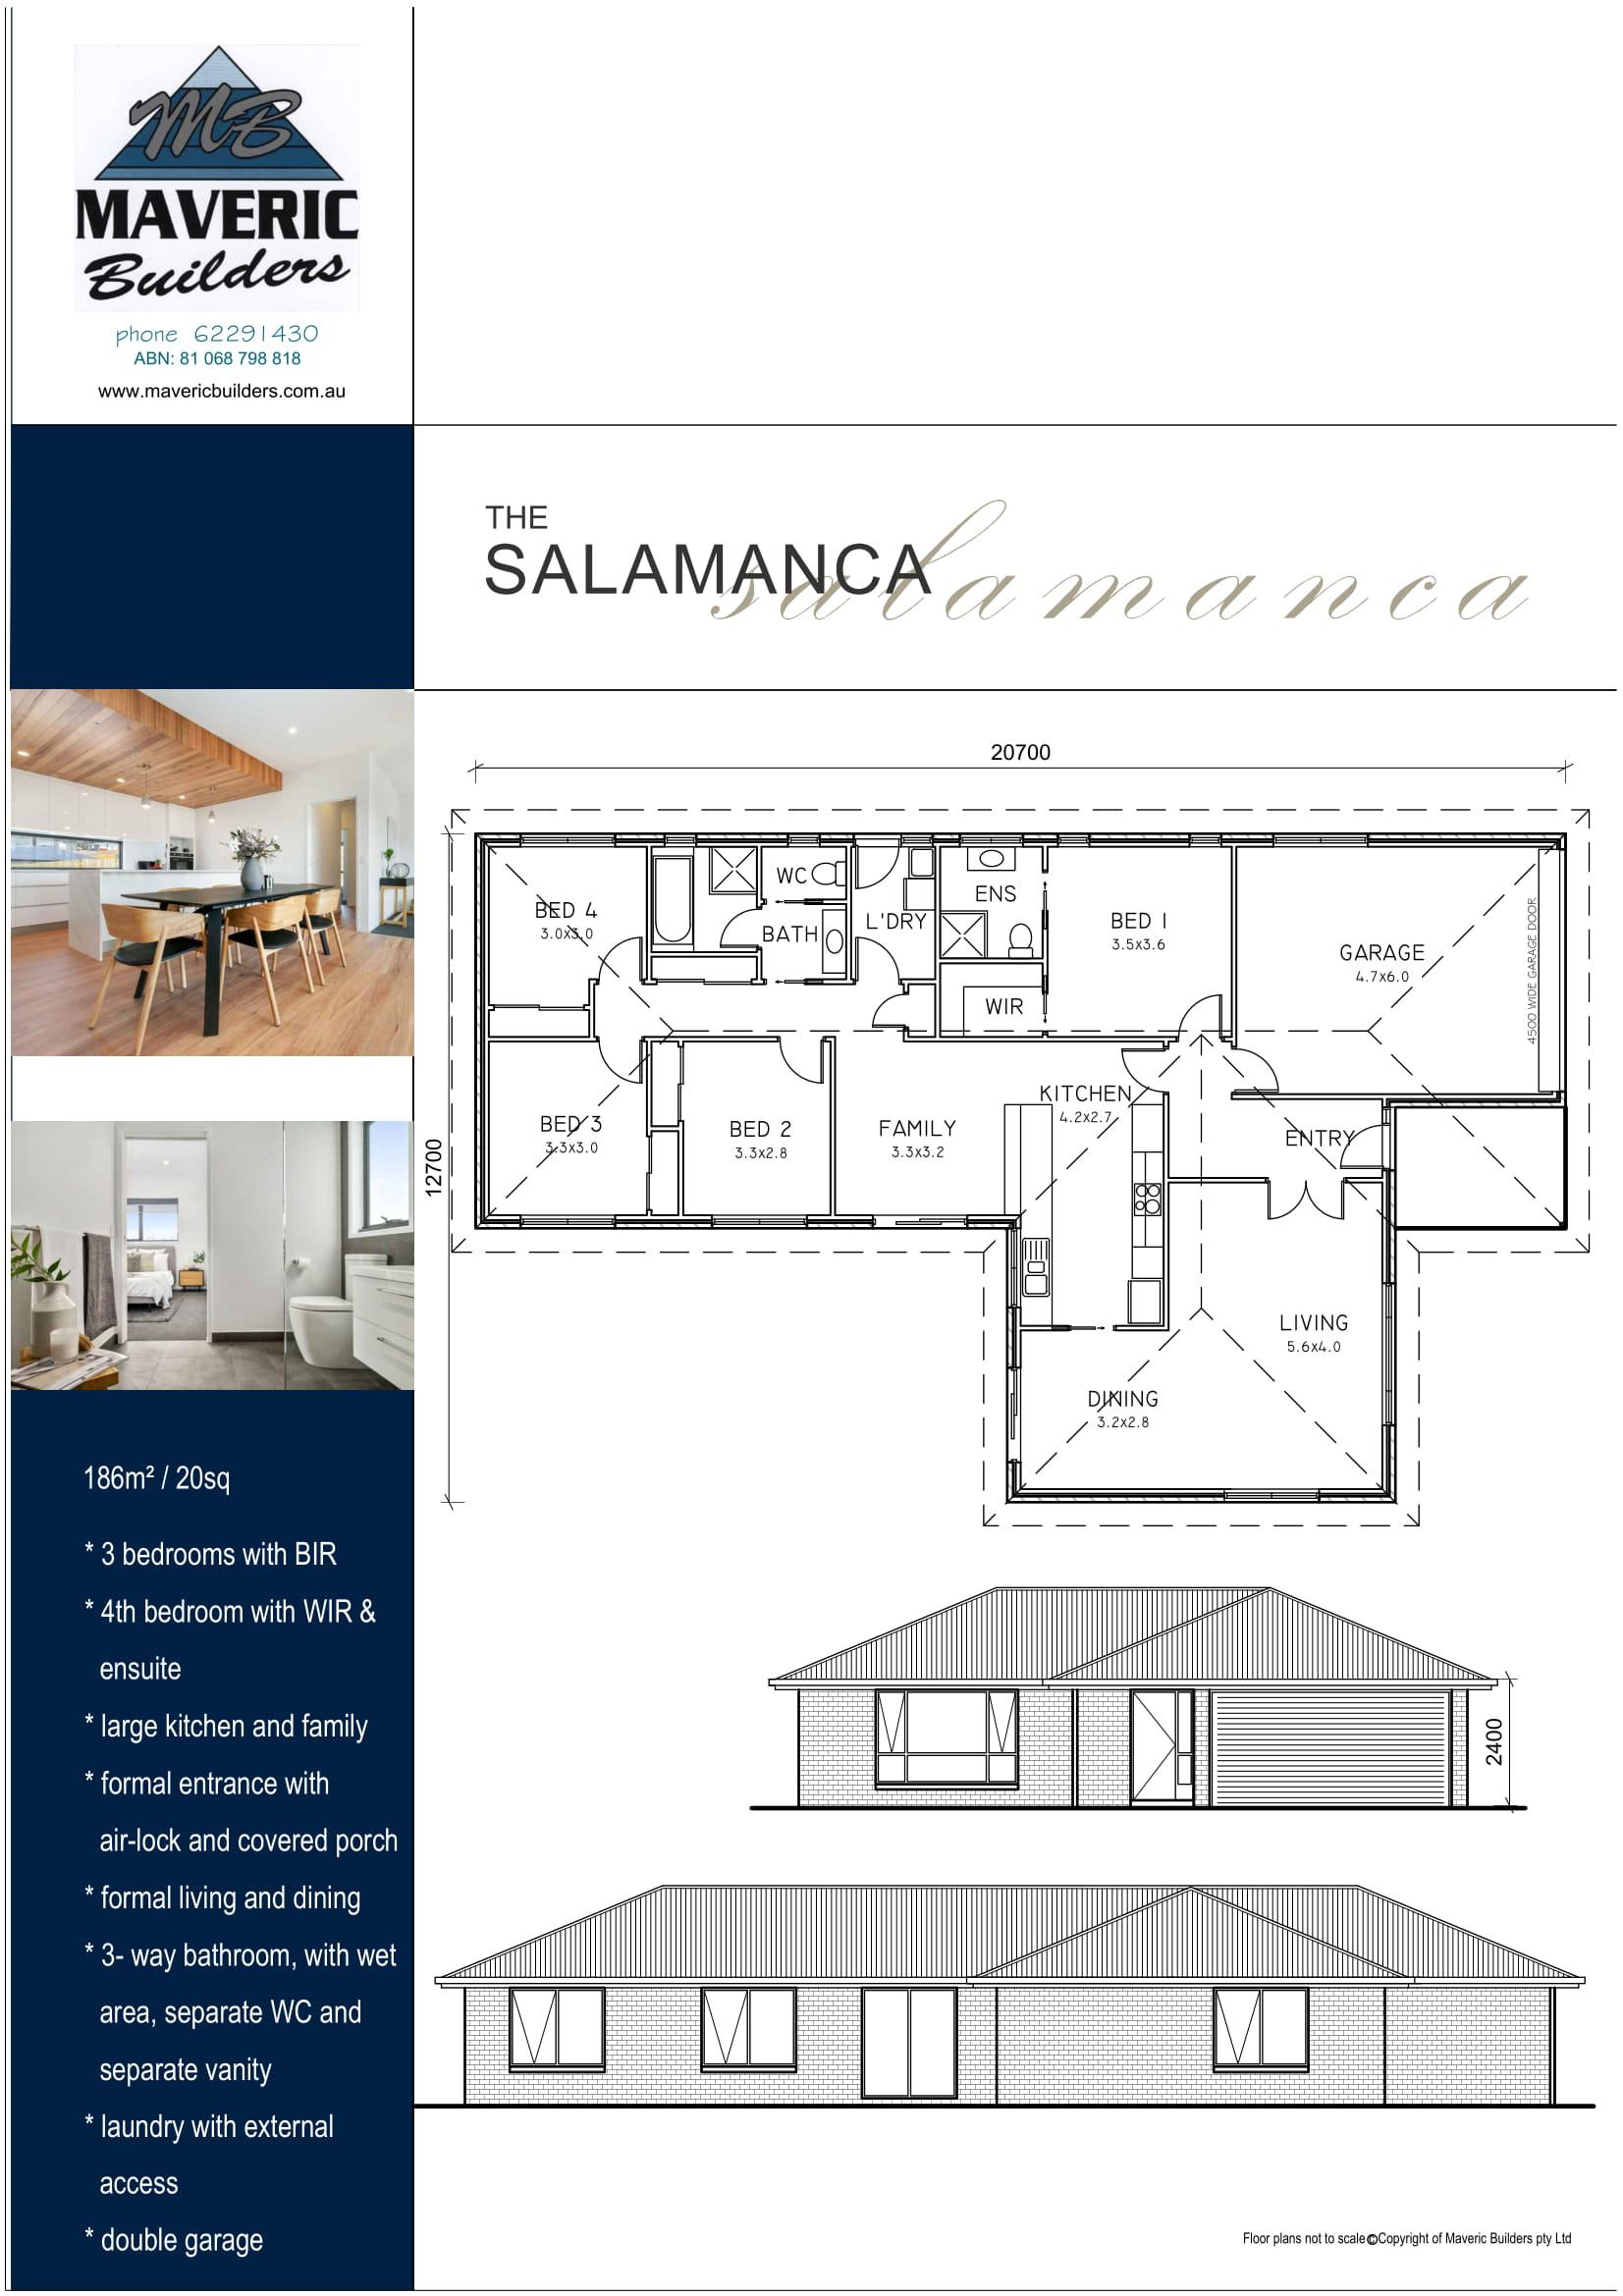 A4 Brochures 2019 01 - 24-17.jpg